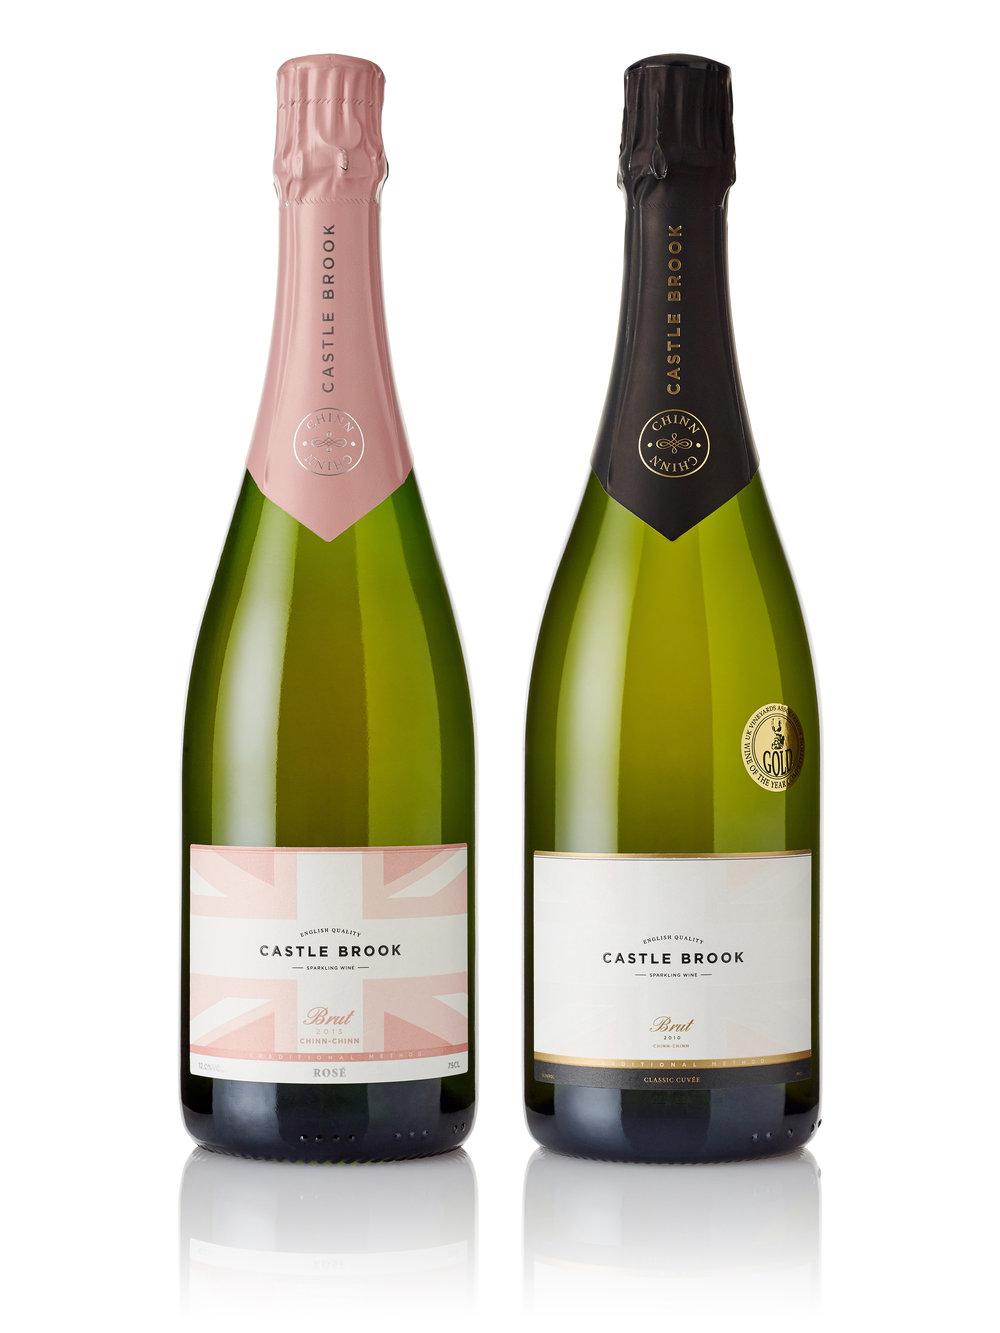 Castle Brook Vineyard's English Sparkling Wines